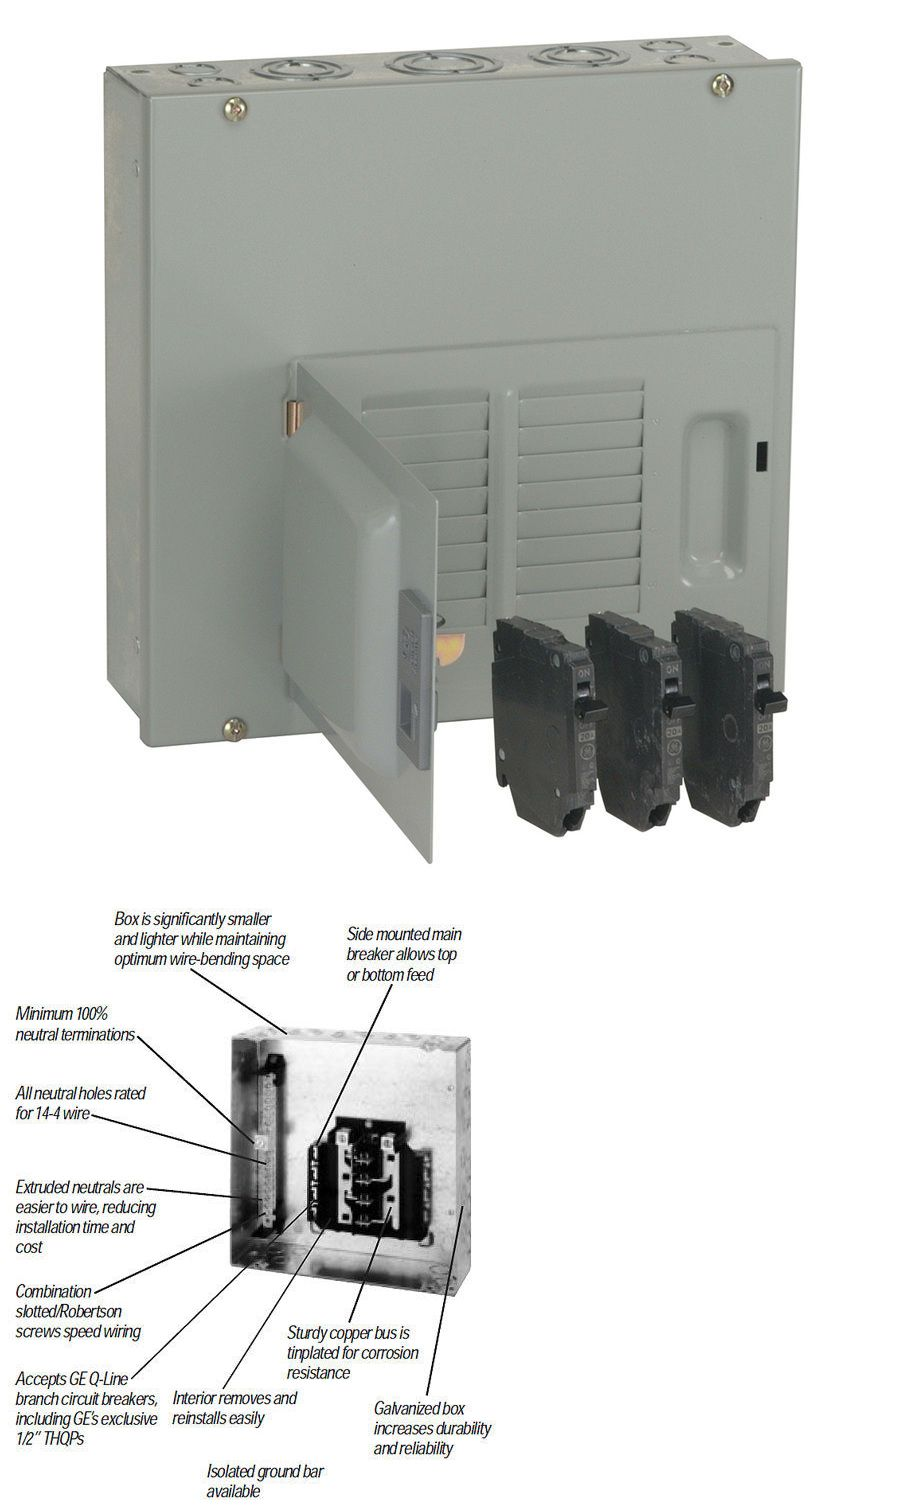 54dd67737ee0ca80349e41070f3d331e box ge fuse tp12f,ge \u2022 j squared co Bussmann Fuses at nearapp.co